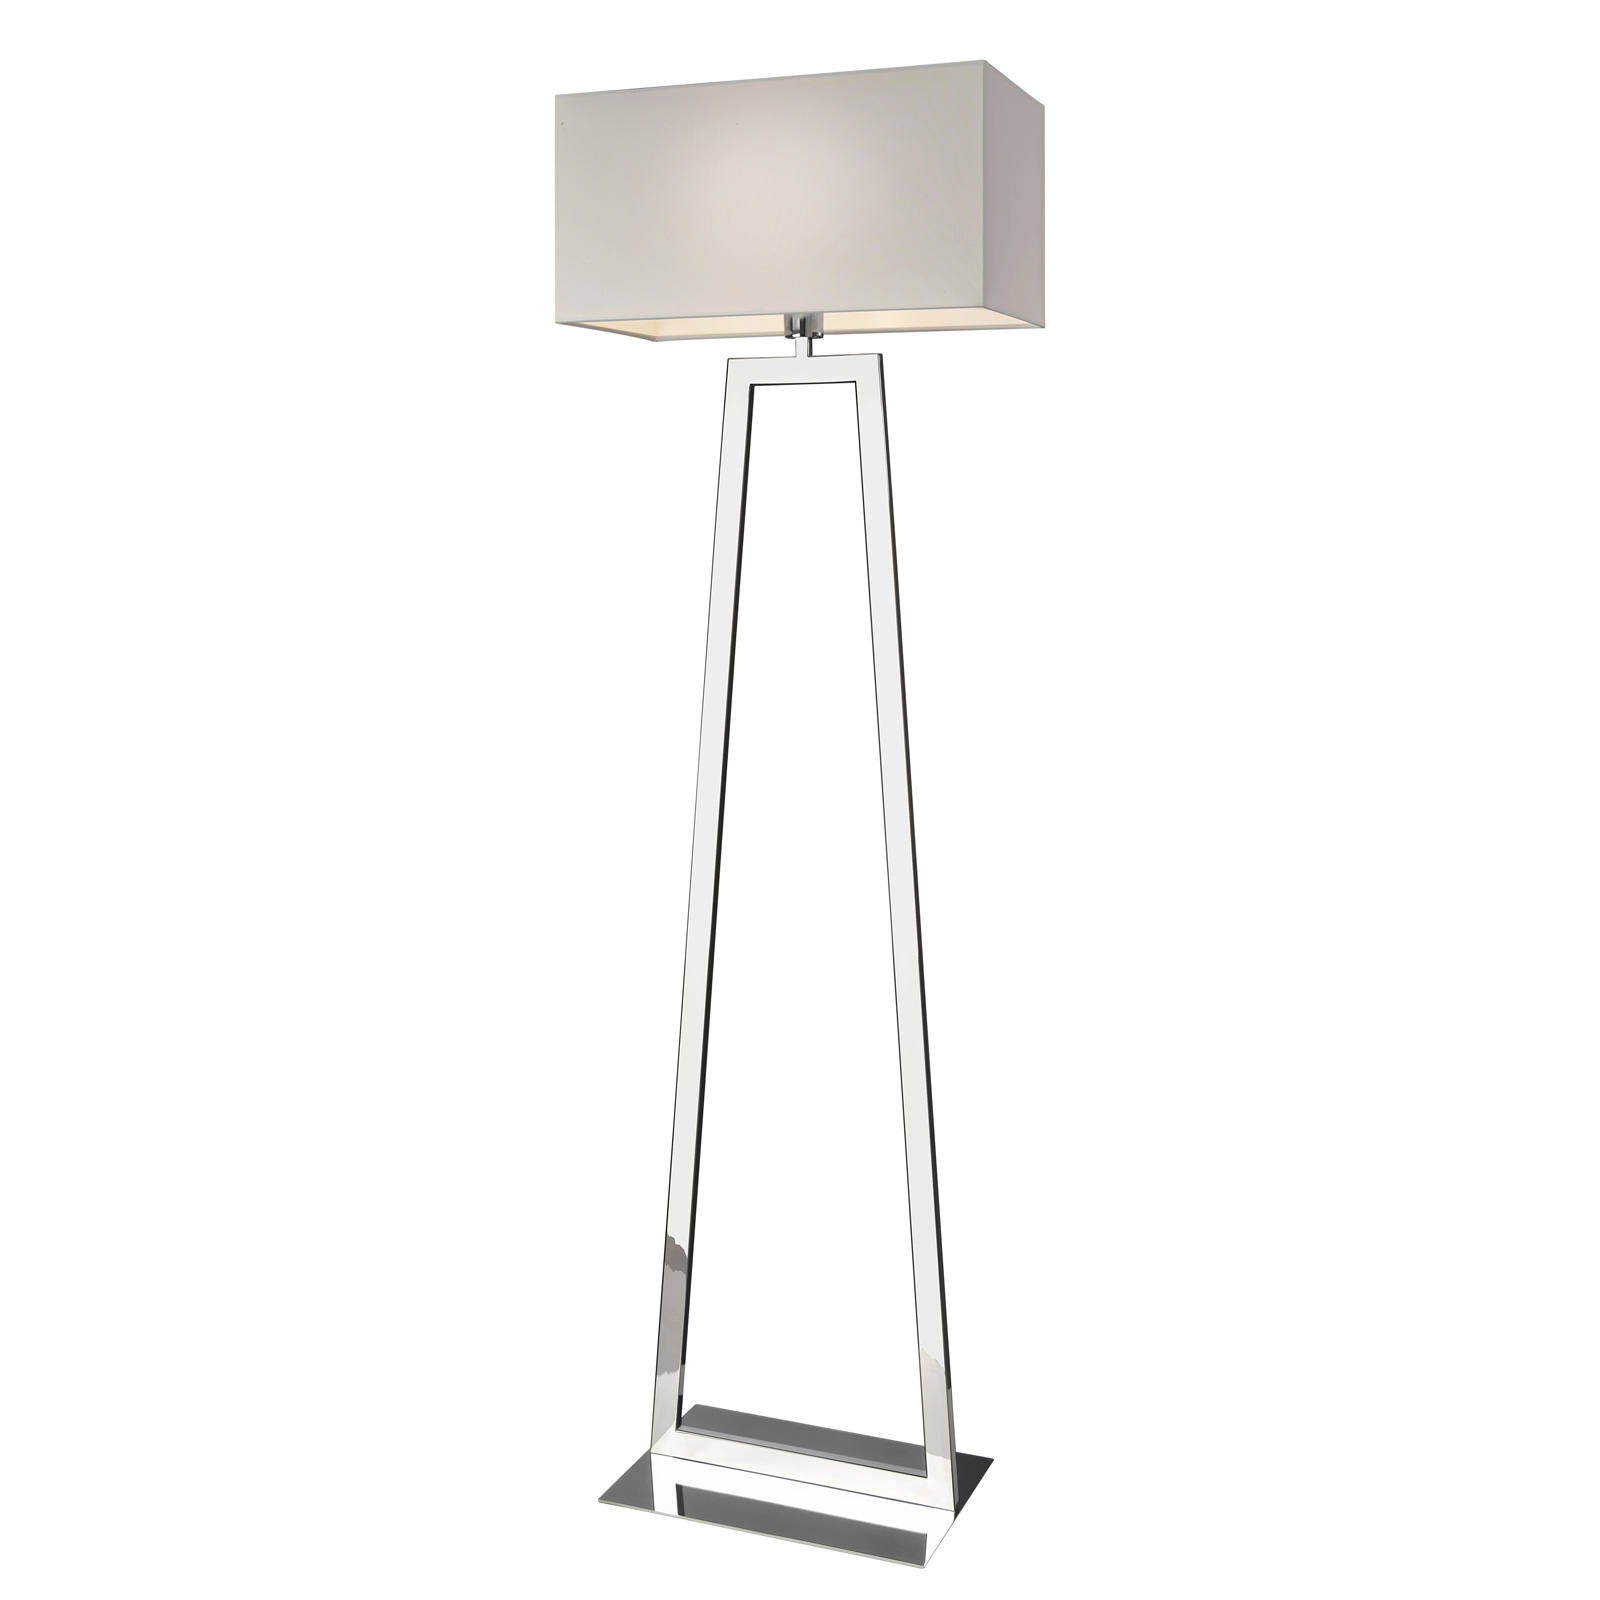 Villeroy & Boch Lyon lampa stojąca stal nierdzewna